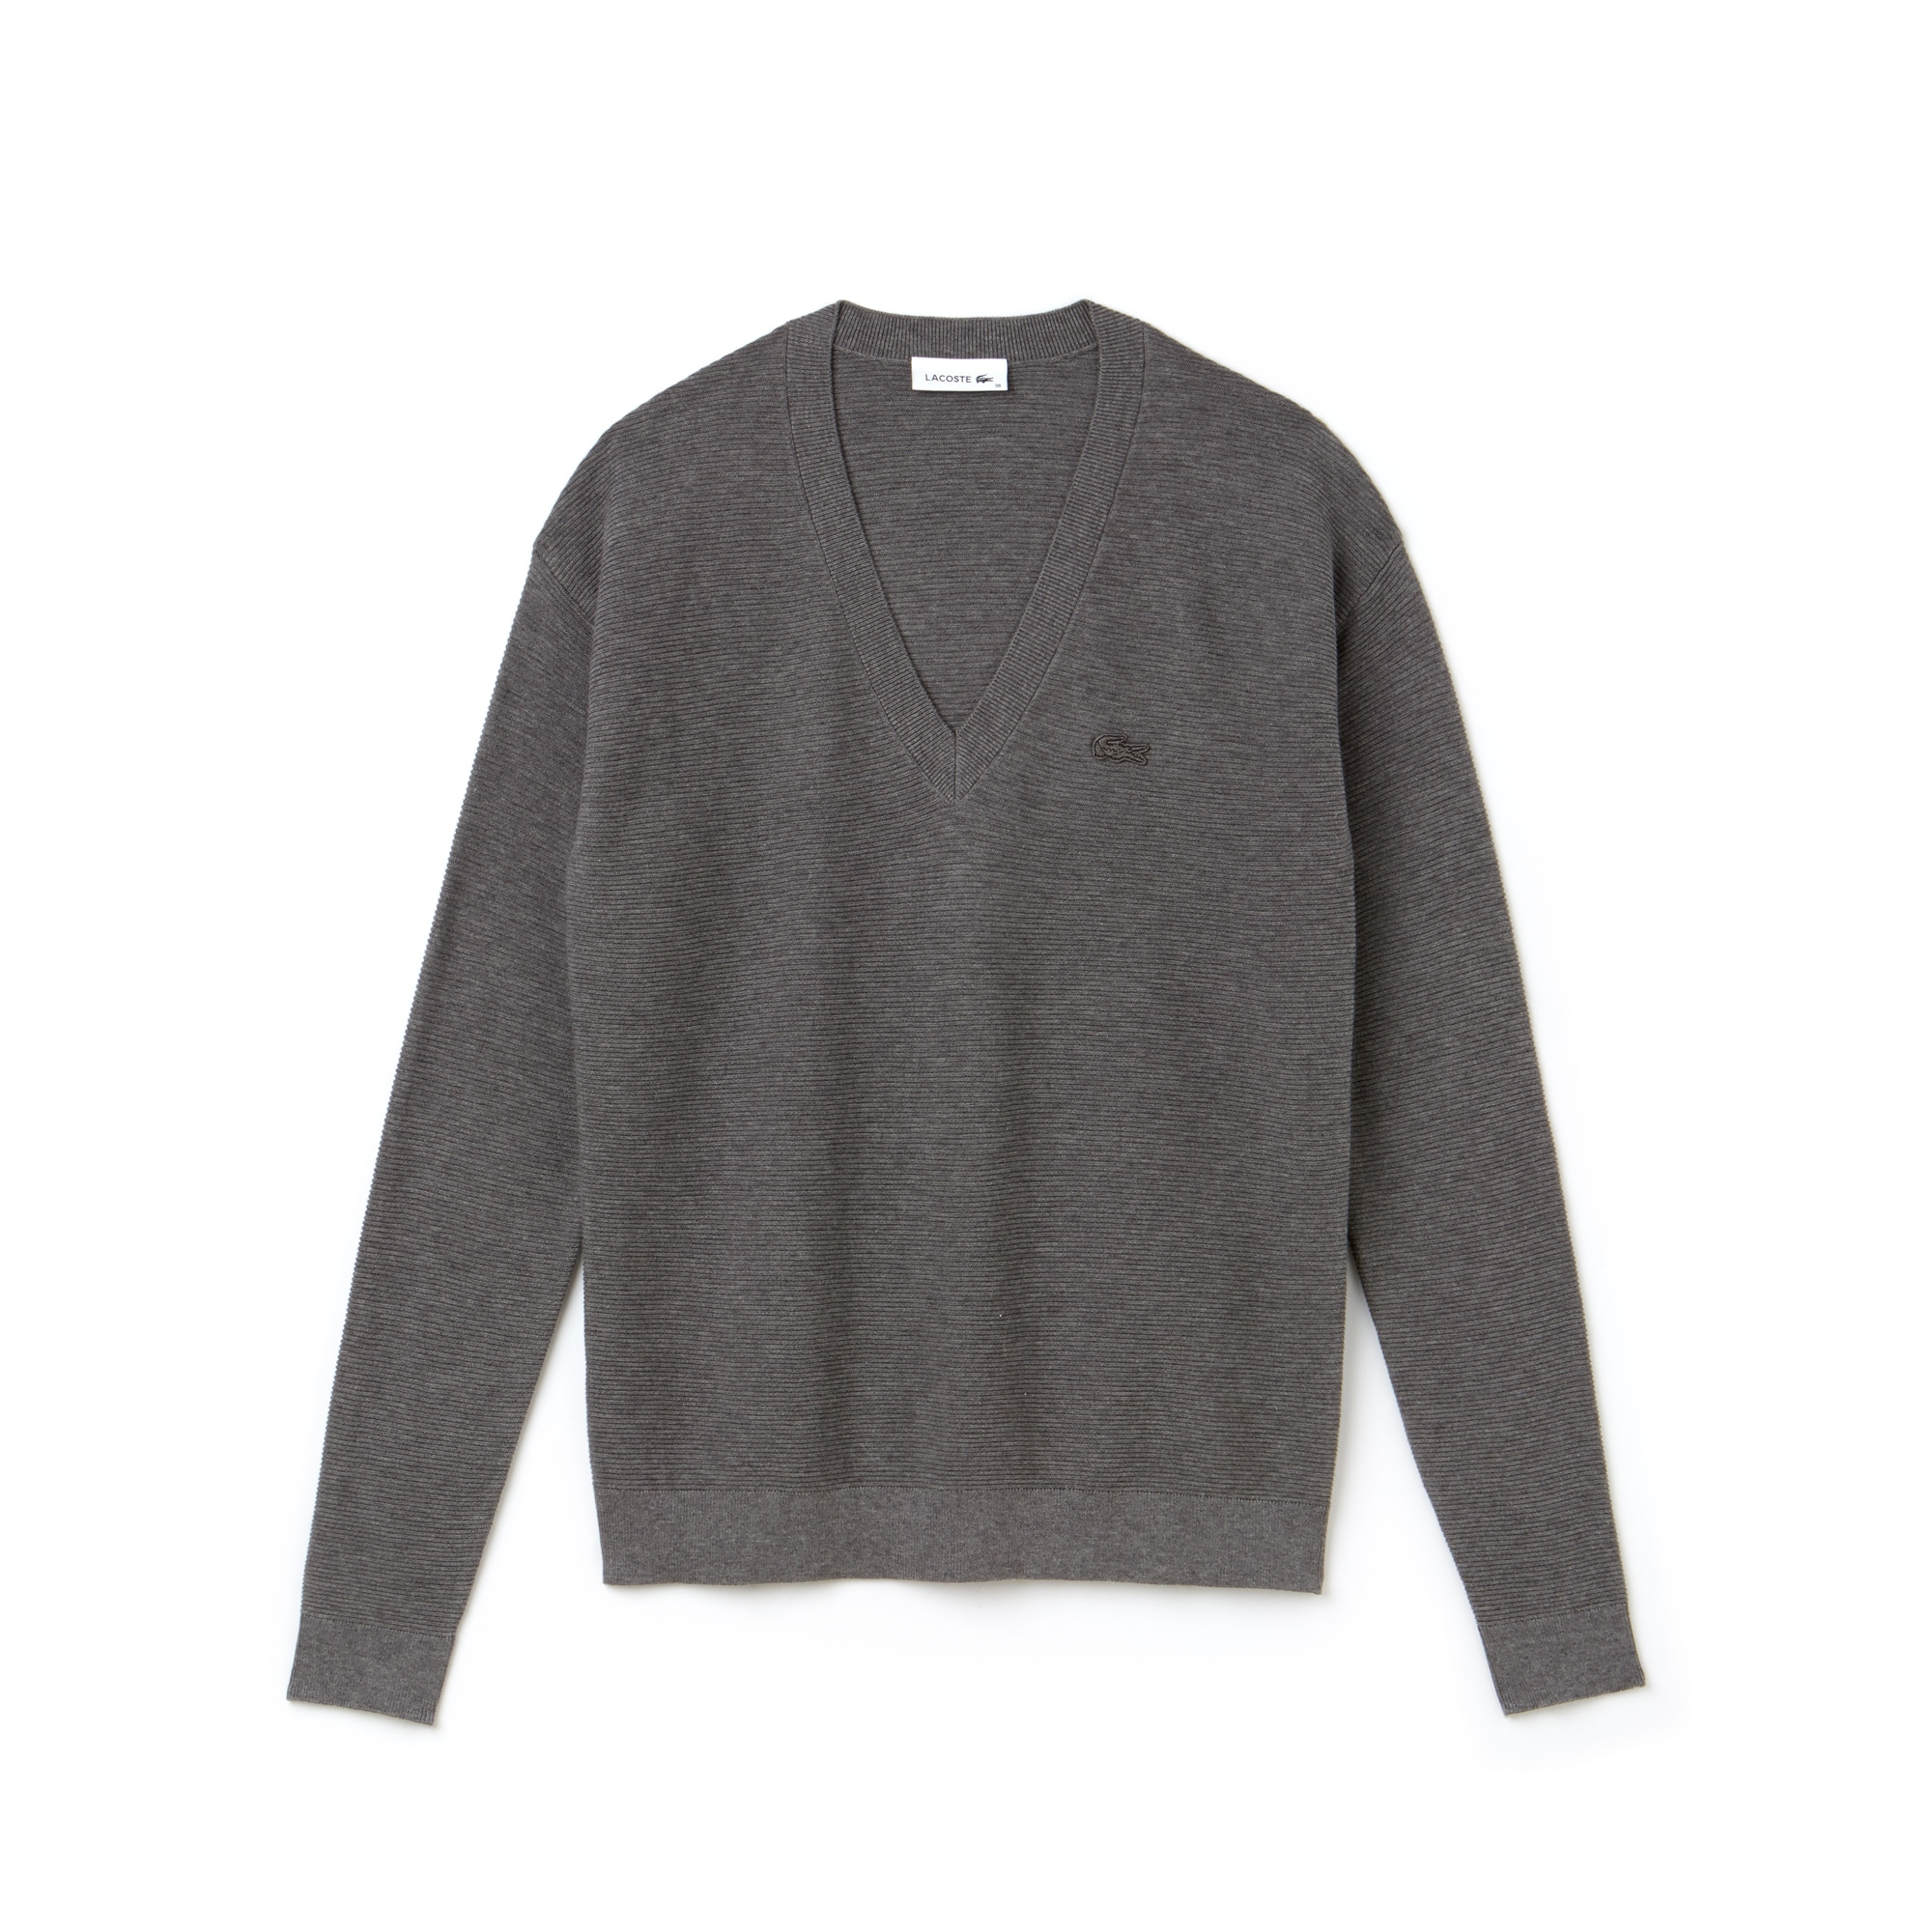 Women's V-neck Seed Stitch Cotton Sweater